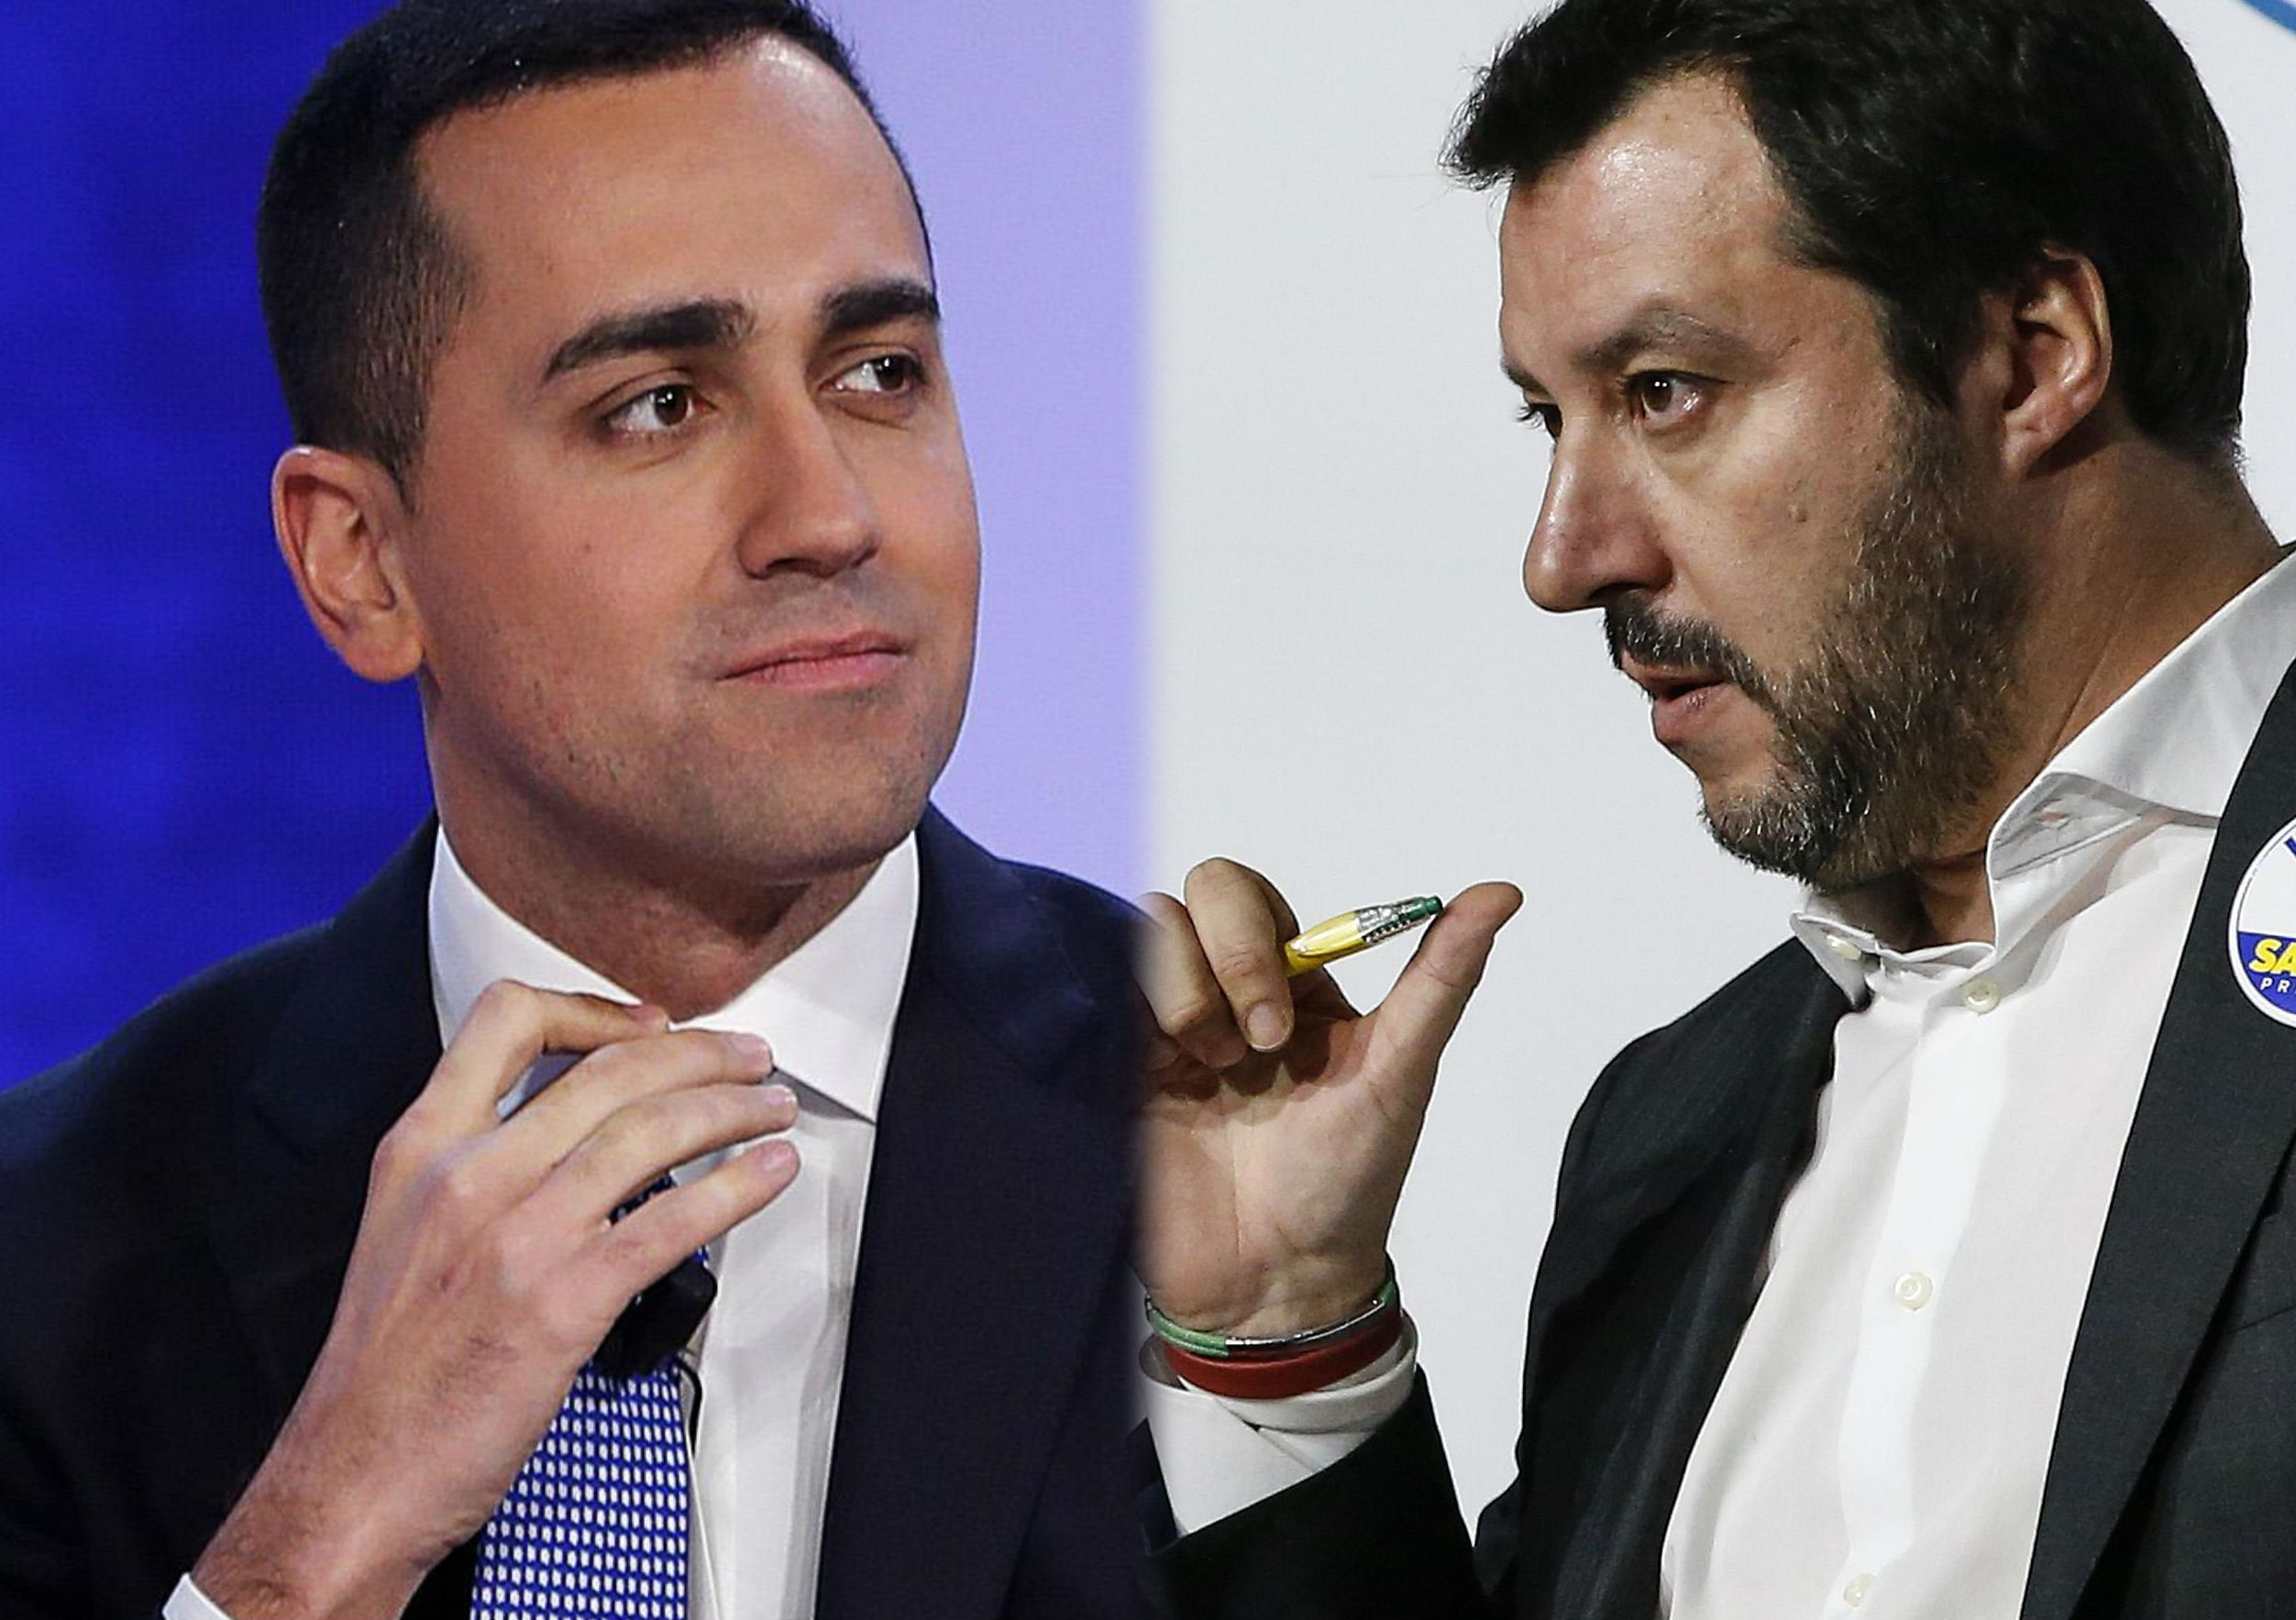 Matteo Salvini e Luigi Di Maio: da nemici giurati a quasi amici